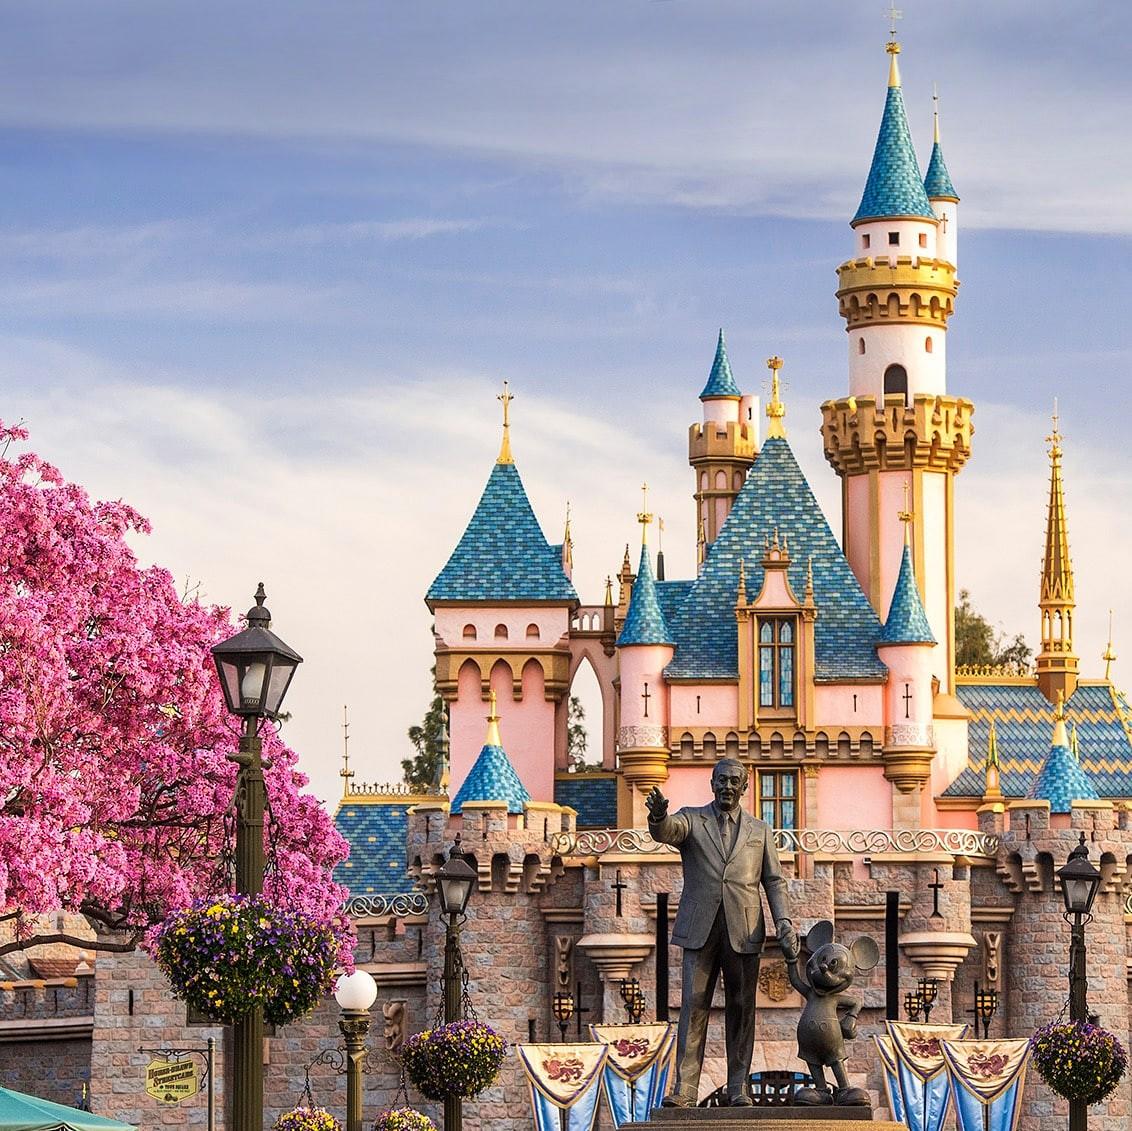 Quel enfant des princesses Disney es-tu ?